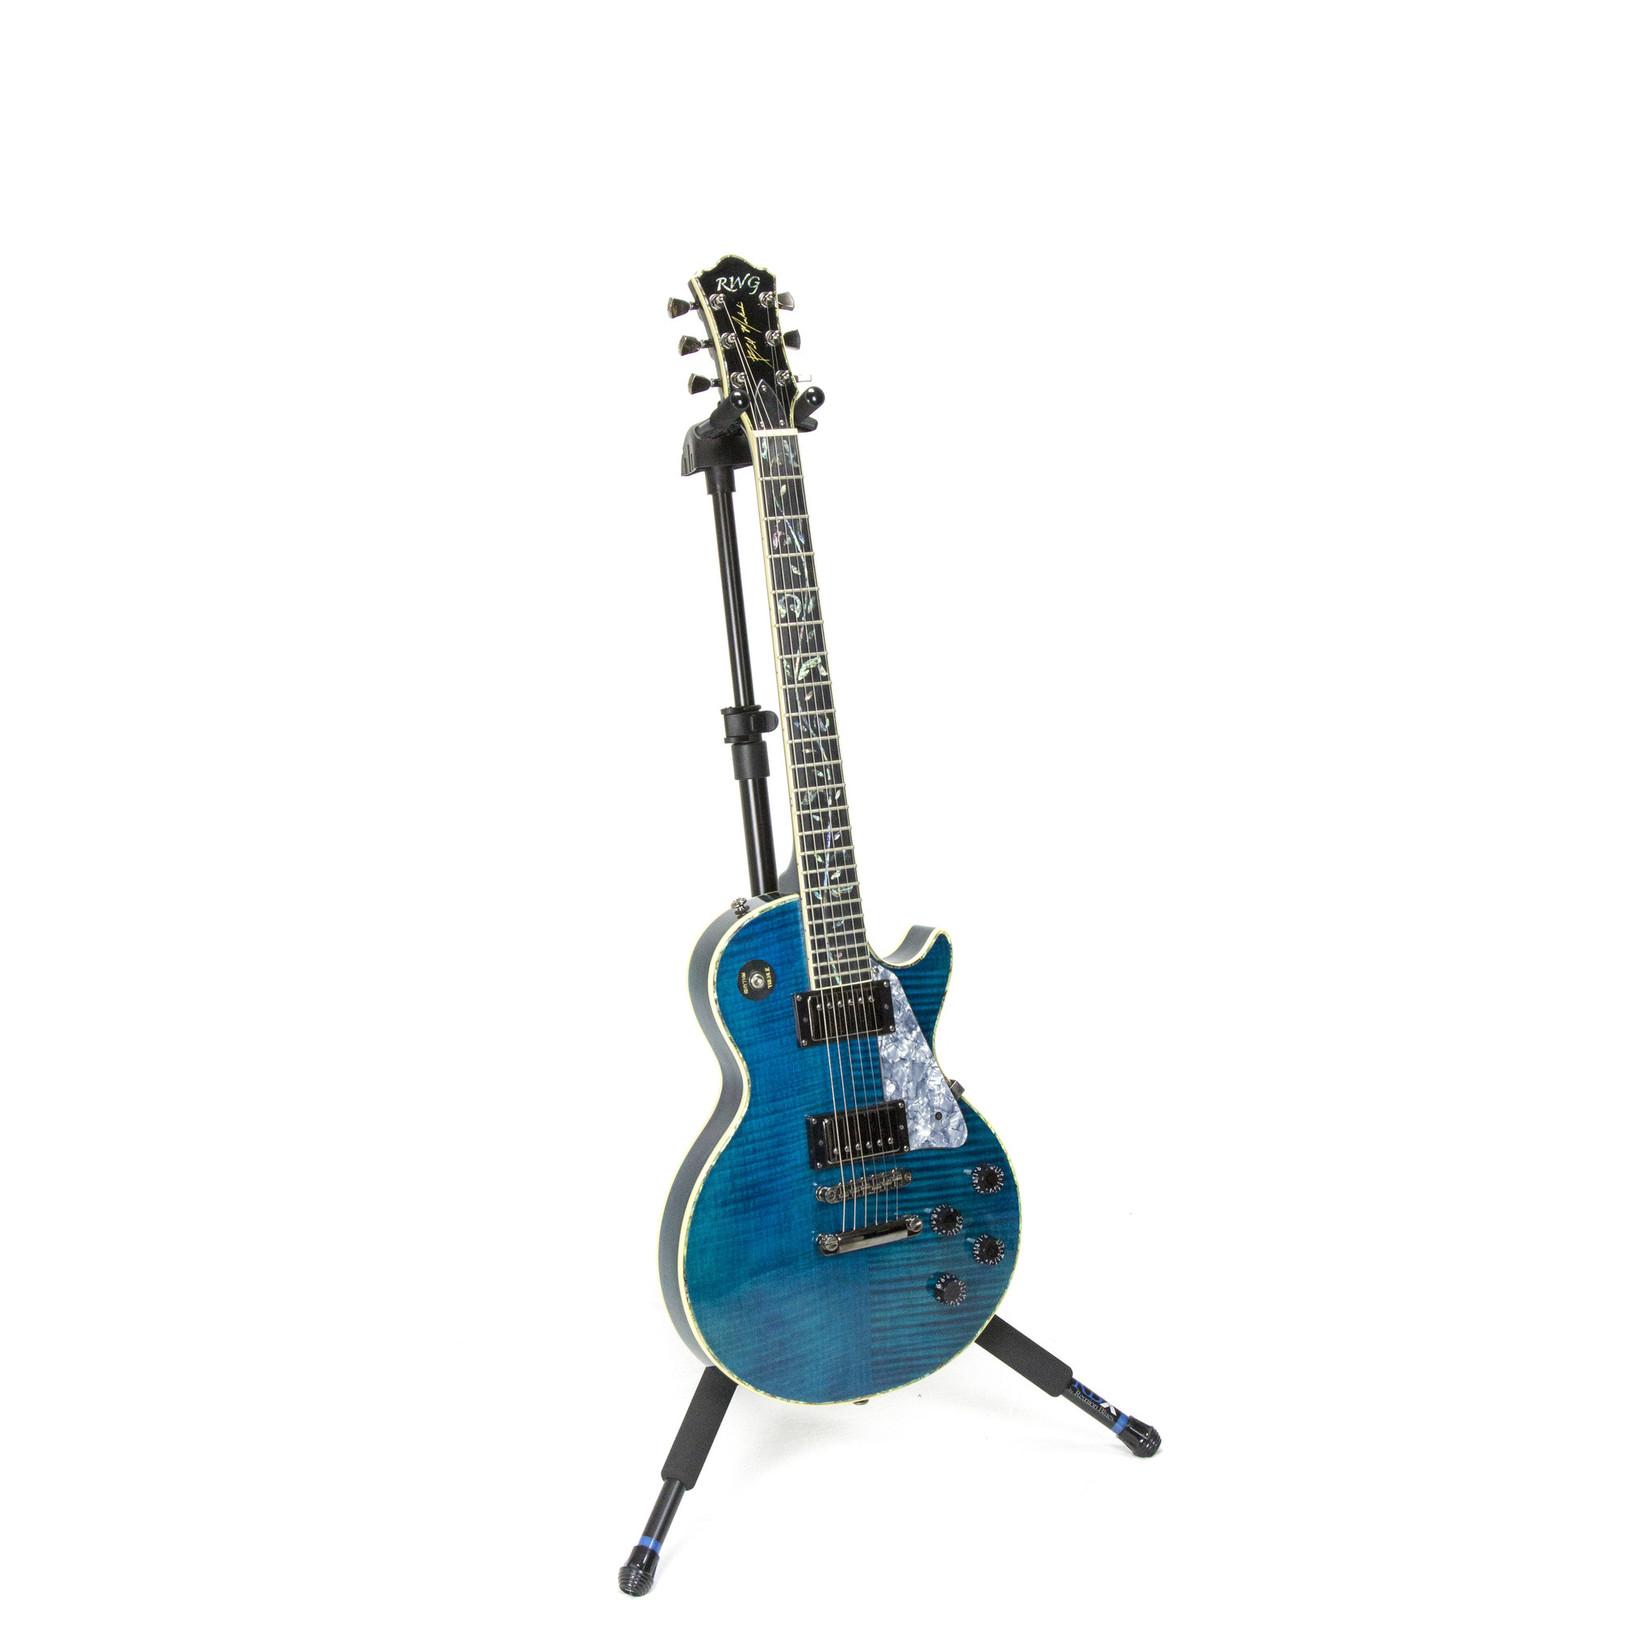 Reunion Blues Reunion Blues RBXS Auto Yoke Hanging Guitar Stand (RBXS-HG3)